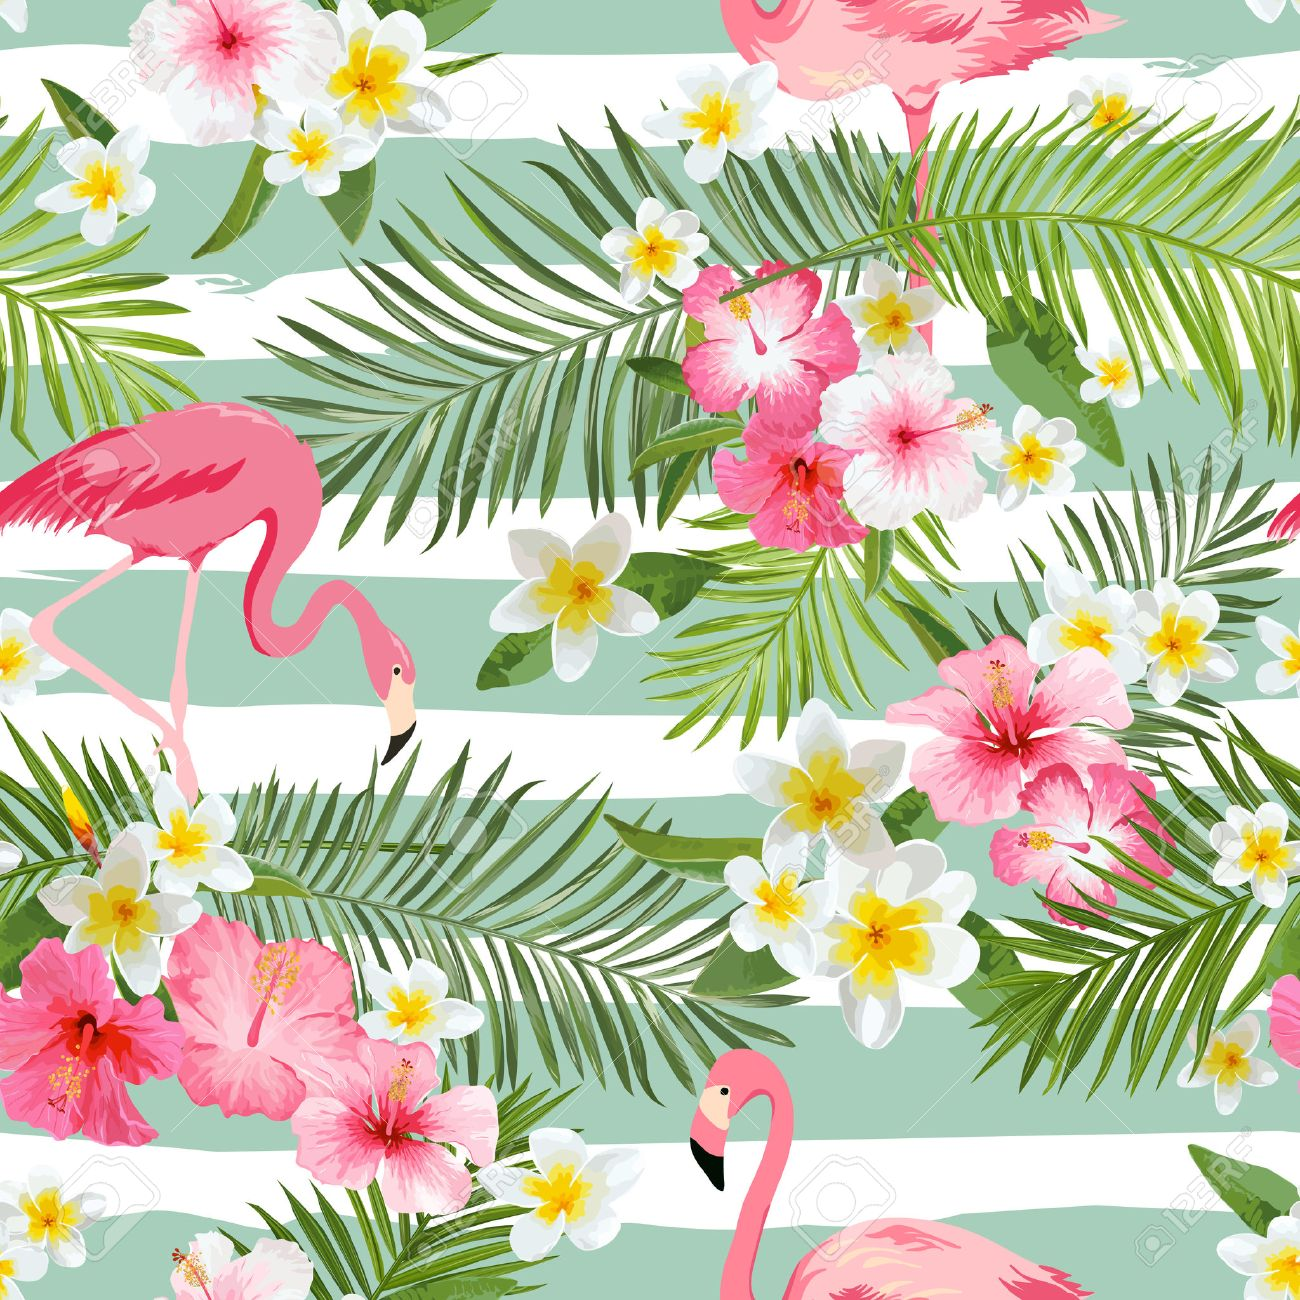 Flamingo Background Tropical Flowers Background Vintage Seamless 1300x1300